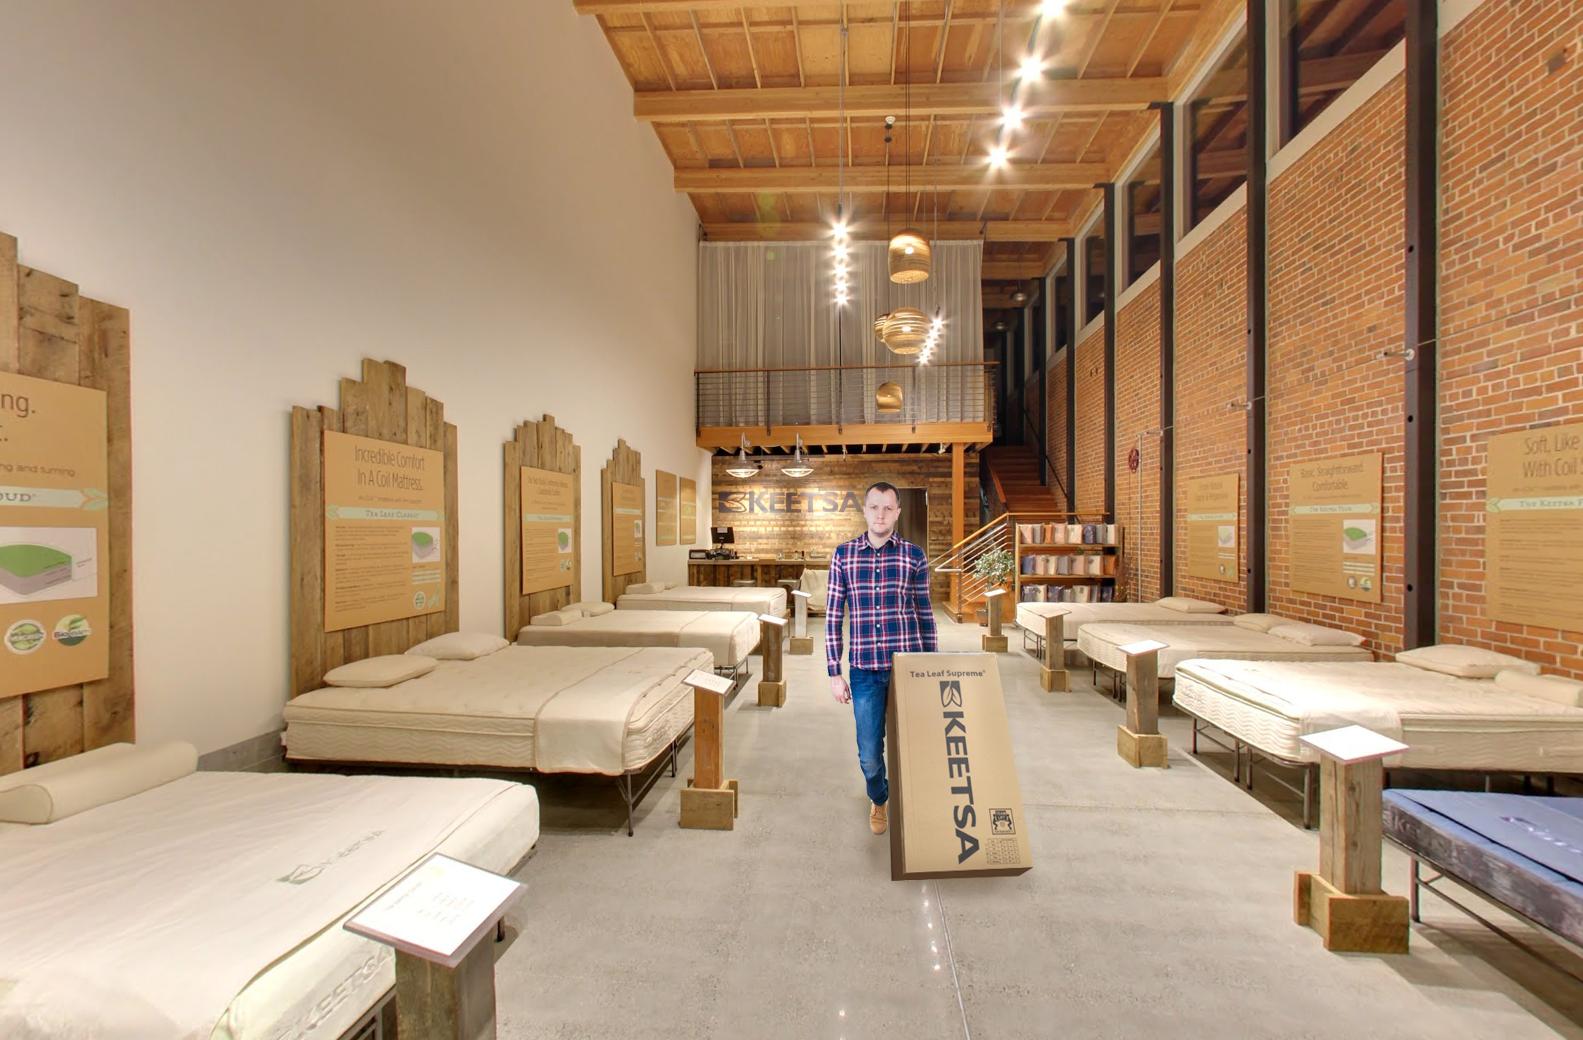 Siteworks design build keetsa berekley ca retail interior design eco sustainable portland oregon 6